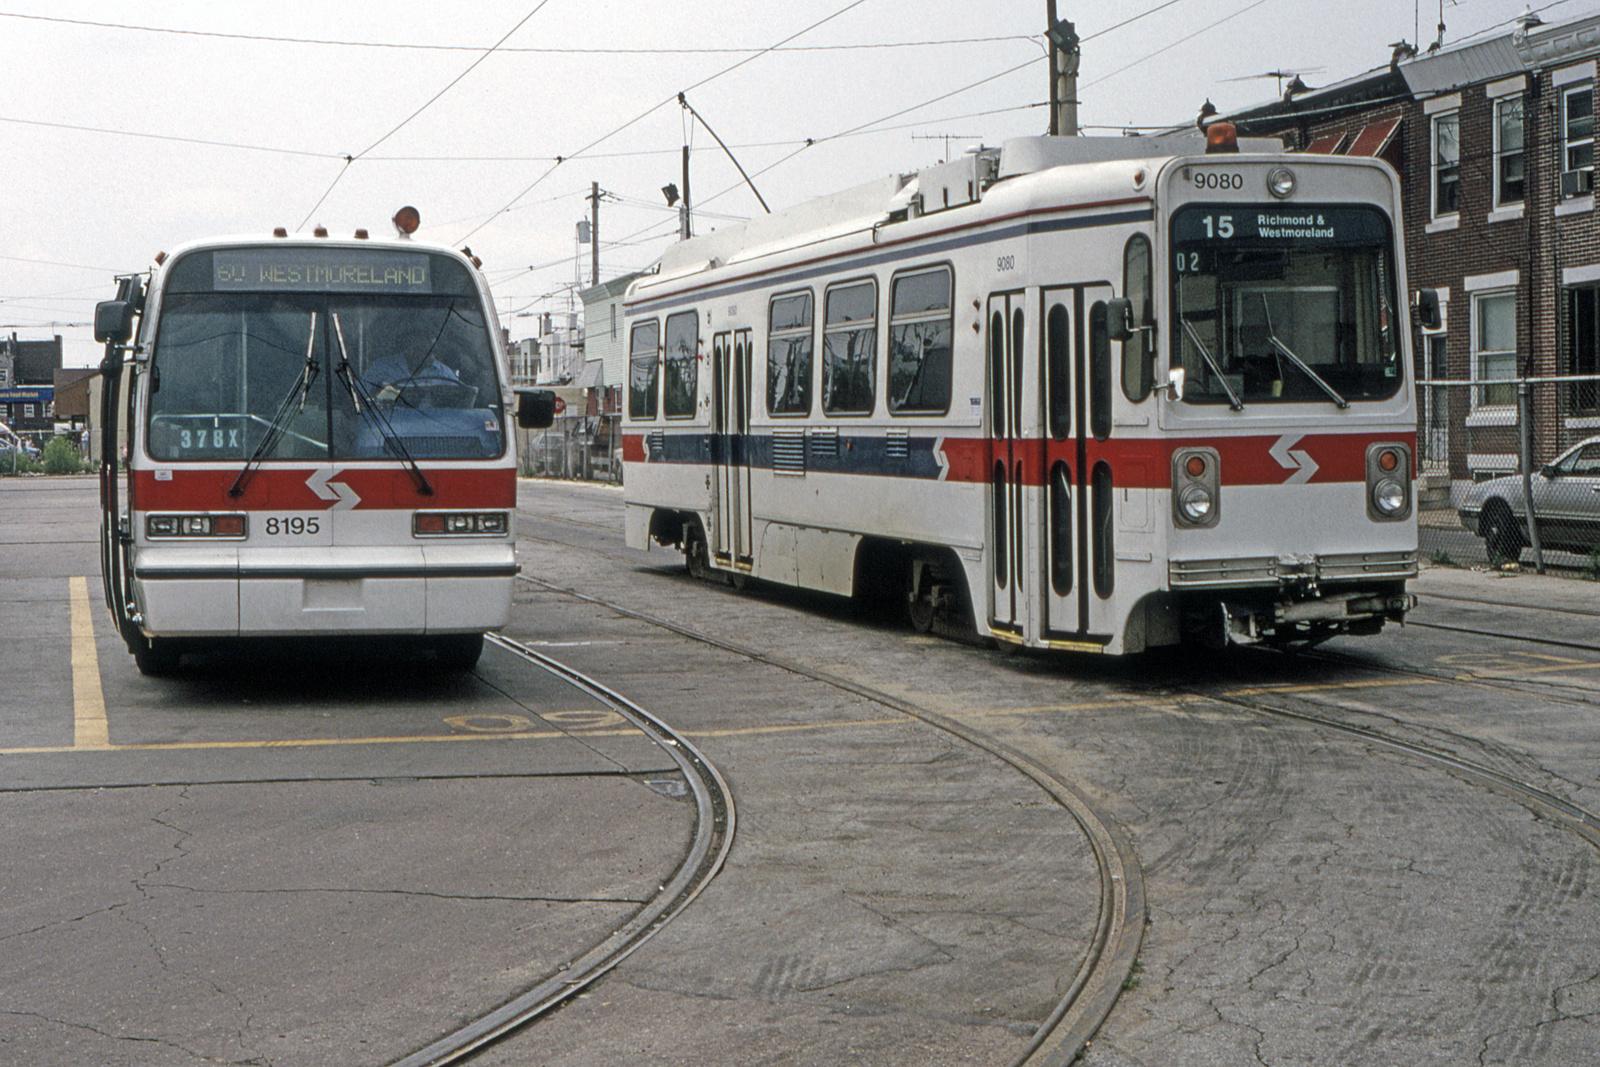 (918k, 1600x1067)<br><b>Country:</b> United States<br><b>City:</b> Philadelphia, PA<br><b>System:</b> SEPTA (or Predecessor)<br><b>Line:</b> Rt. 15-Girard<br><b>Location:</b> Richmond/Westmoreland <br><b>Car:</b> SEPTA K Single-ended (Kawasaki, 1981) 9080 <br><b>Collection of:</b> David Pirmann<br><b>Date:</b> 6/20/1992<br><b>Viewed (this week/total):</b> 0 / 26